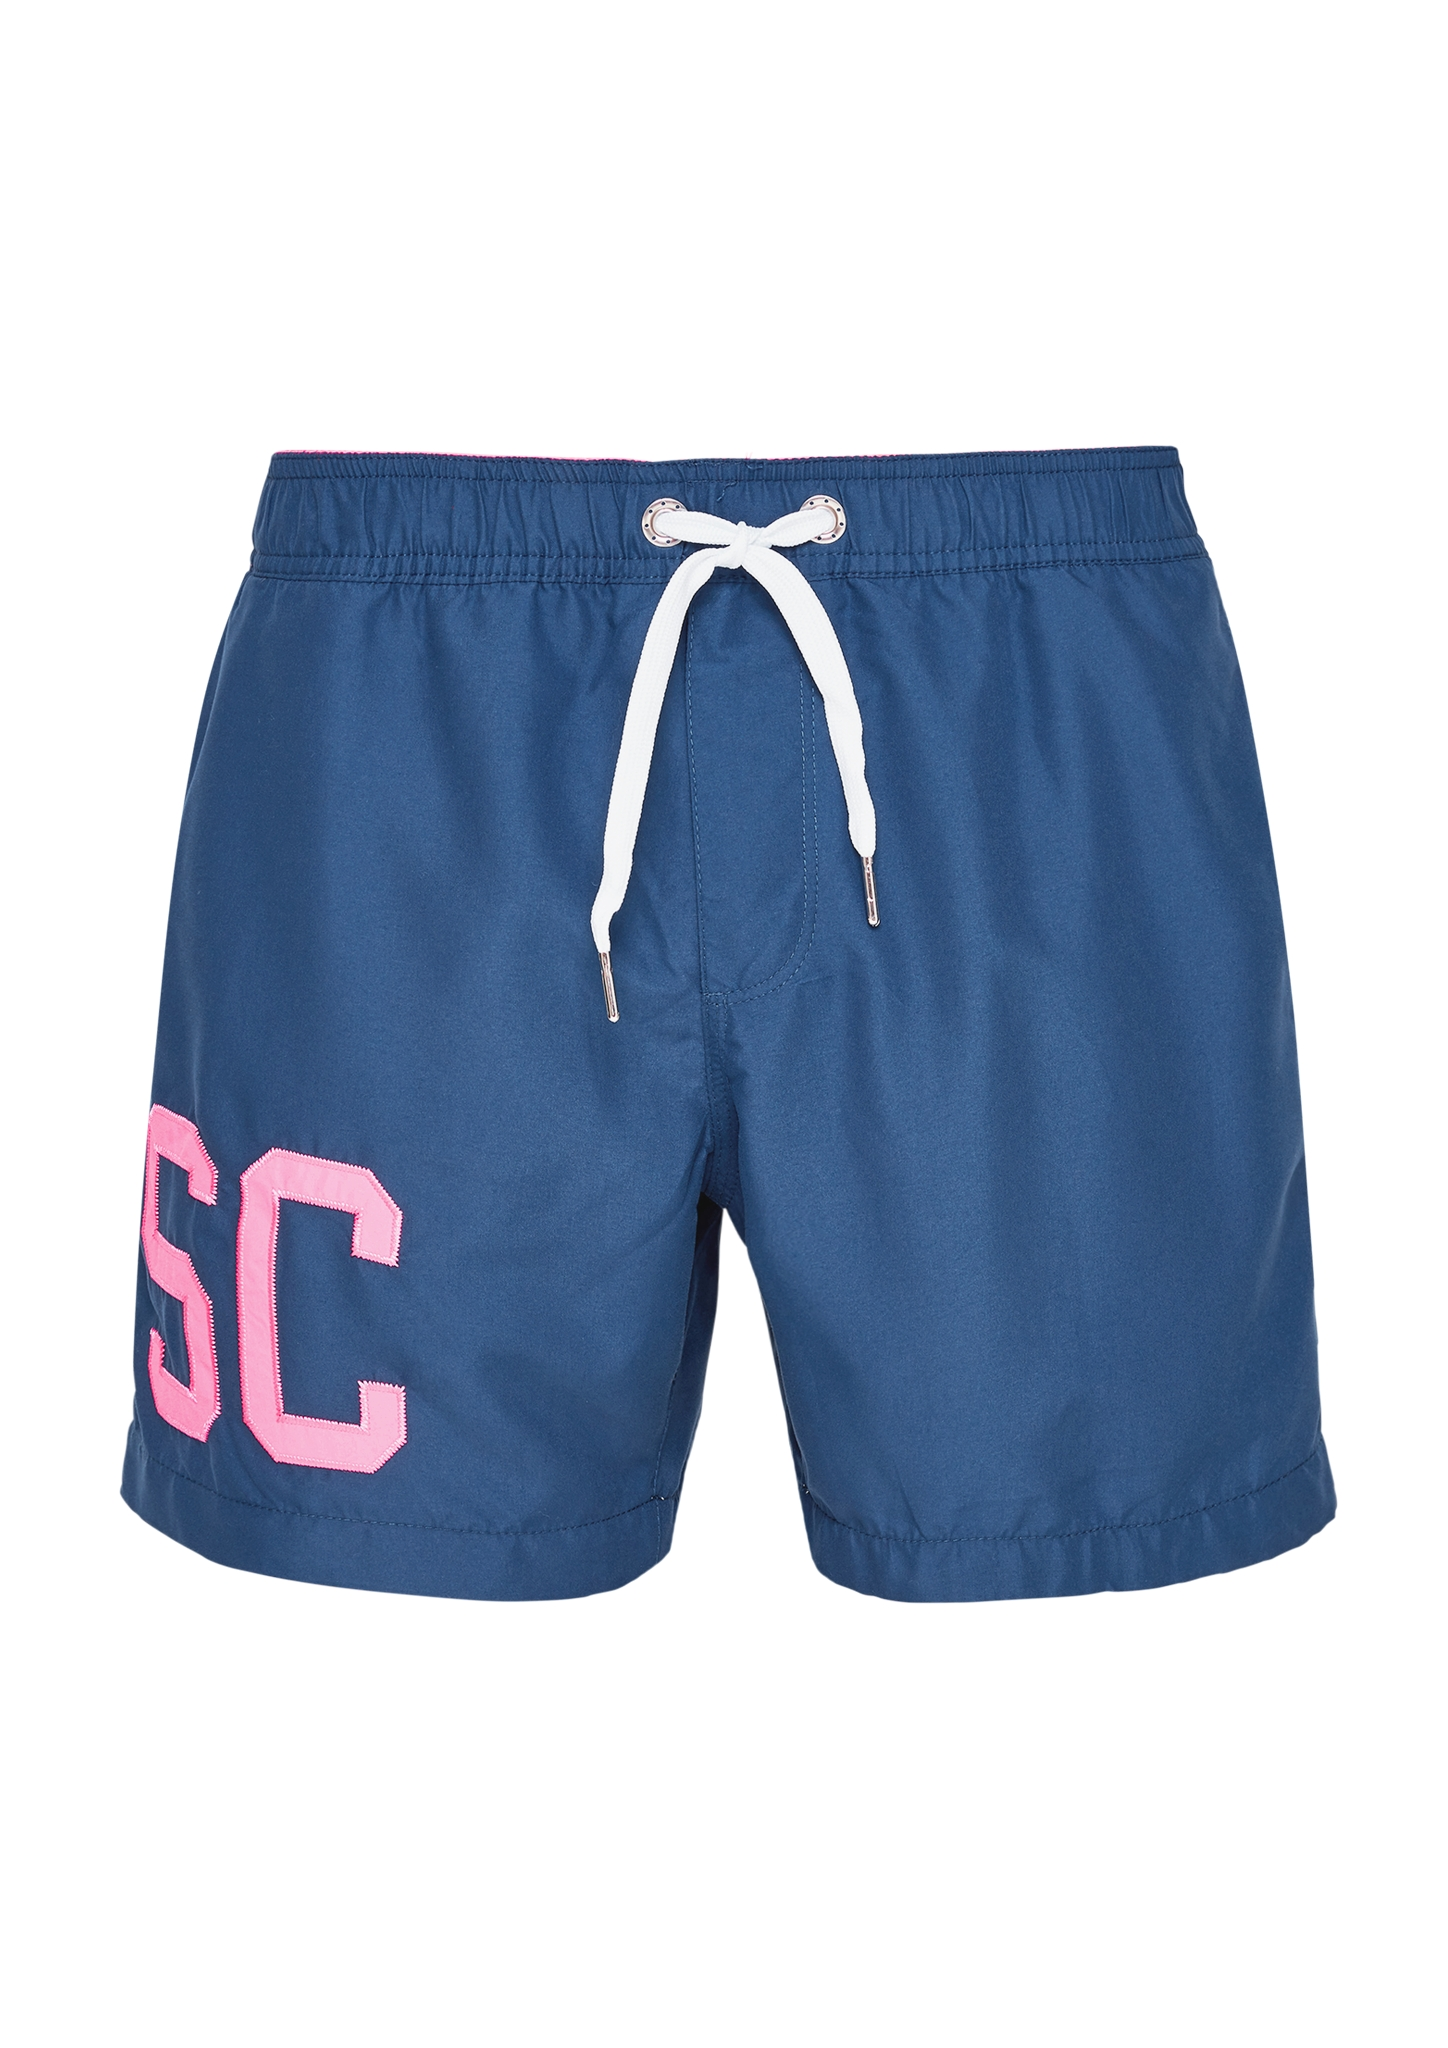 Badeshorts | Bekleidung > Bademode | Blau | Oberstoff: 100% polyester| futter: 100% polyester | s.Oliver